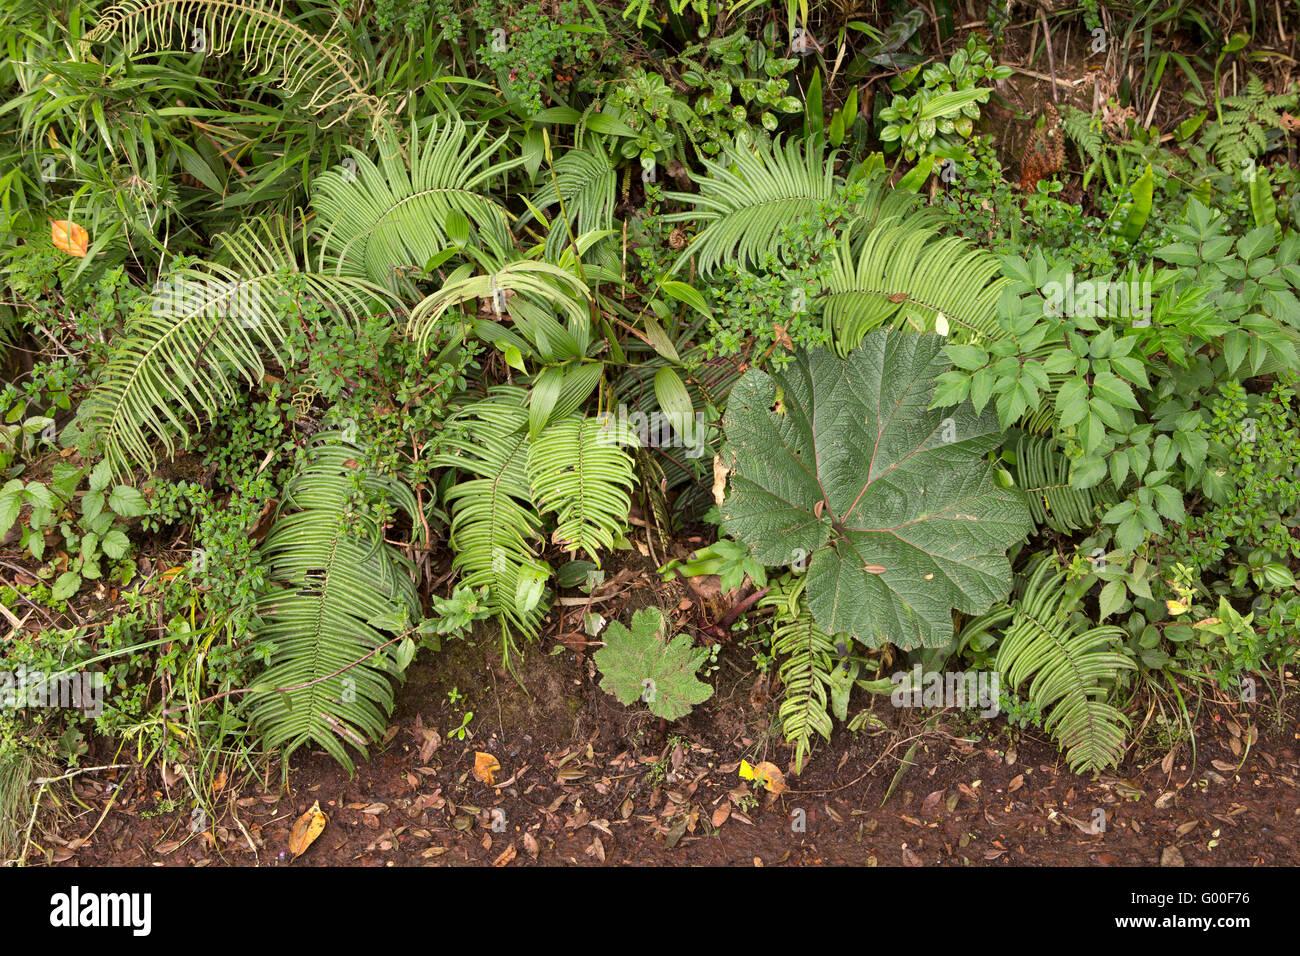 Ferns and a poor man's umbrella plant in the Parque Nacional Volcan Poas (Poas Volcano National Park) in Costa - Stock Image